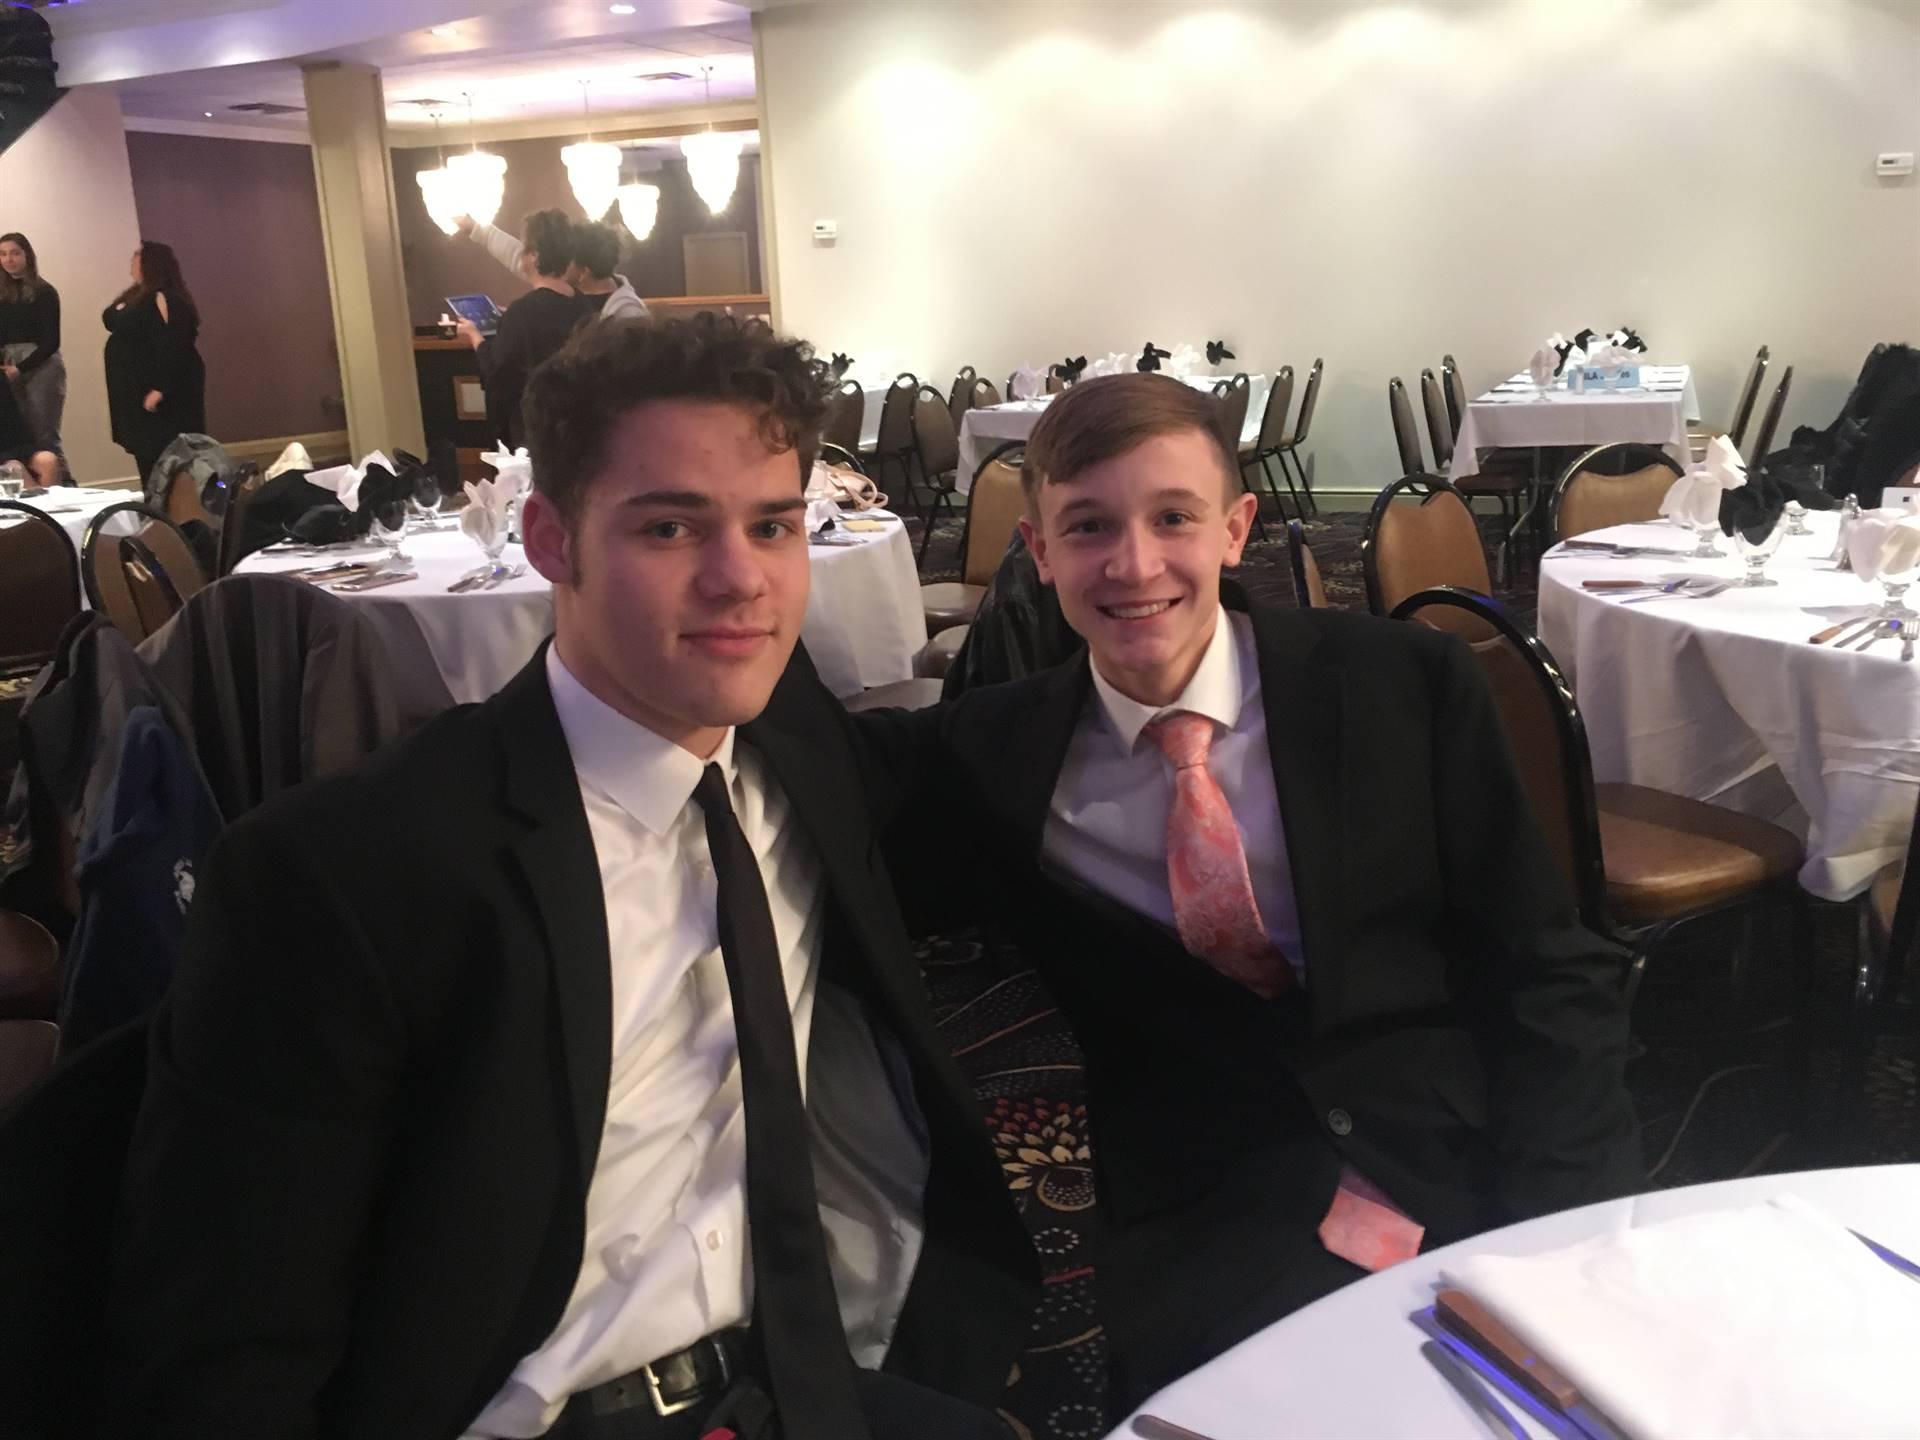 Ian and Ben